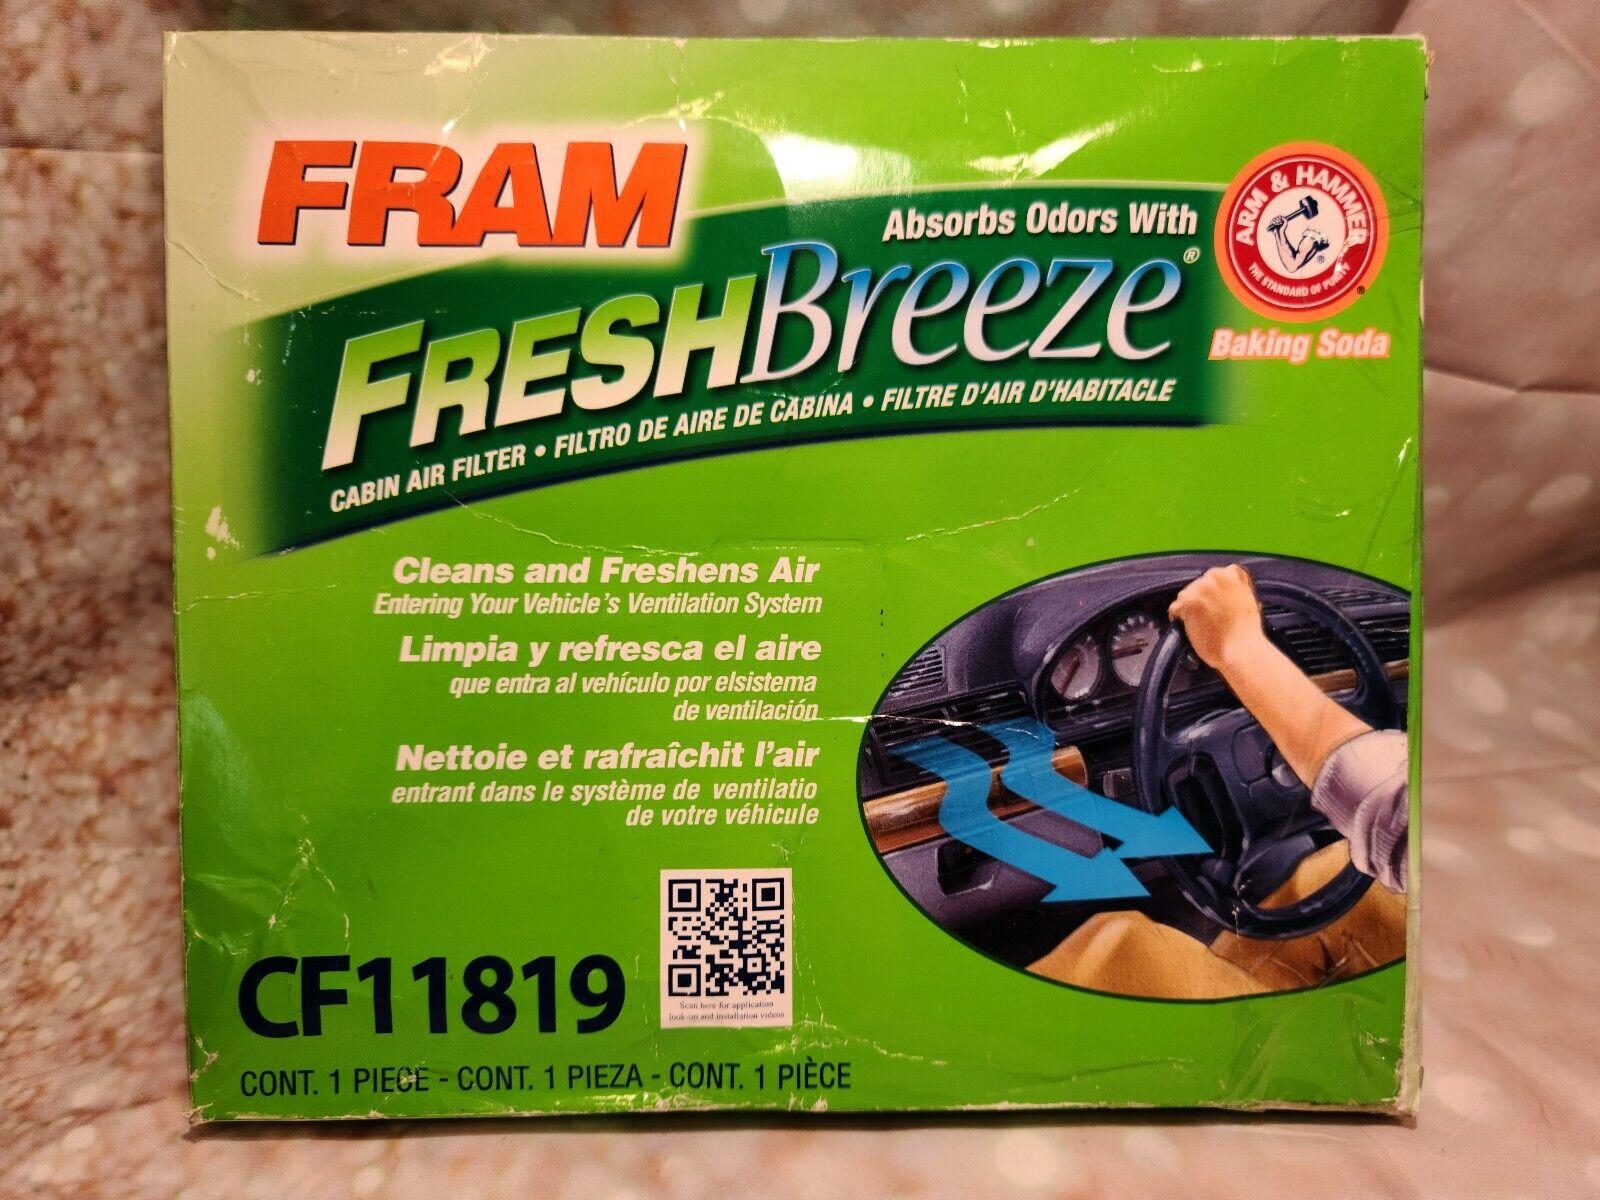 CF10742 Cabin Air Filter fits AC CF177 GM 19130294 Fram Fresh Breeze CF11819